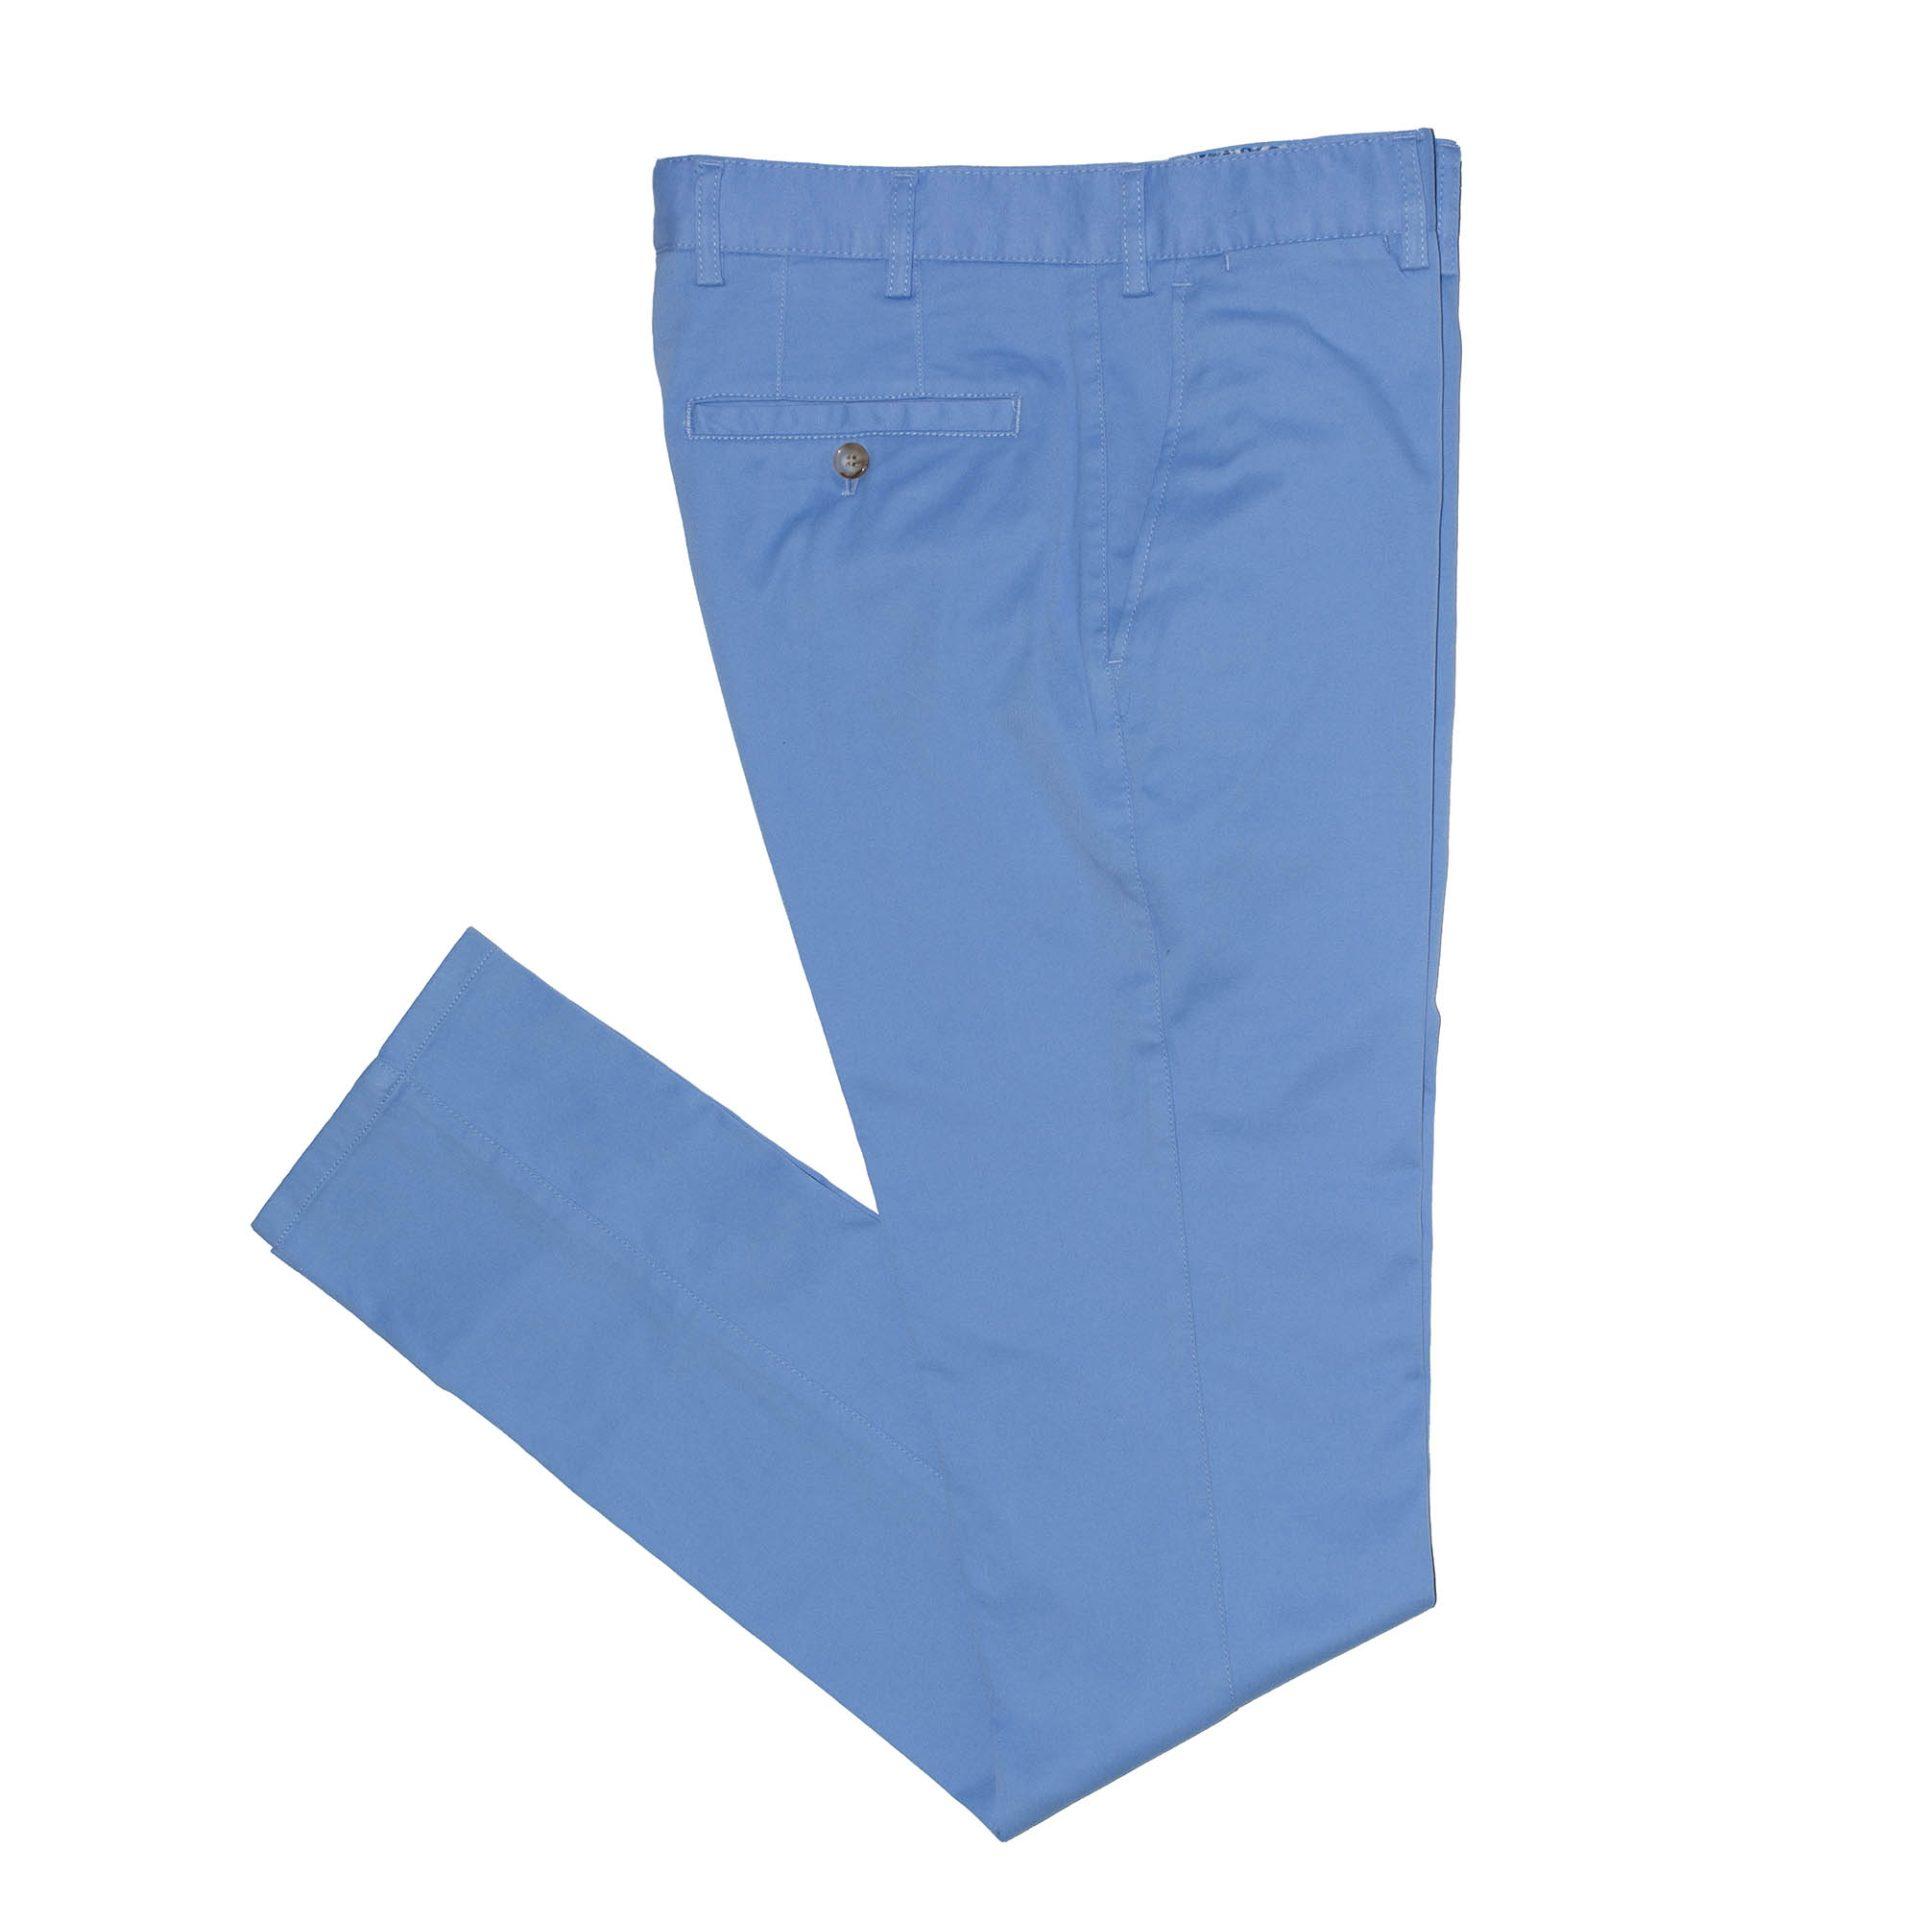 JAGGS-chino-pret-a-porter-essentiels-bleu-ciel-regular